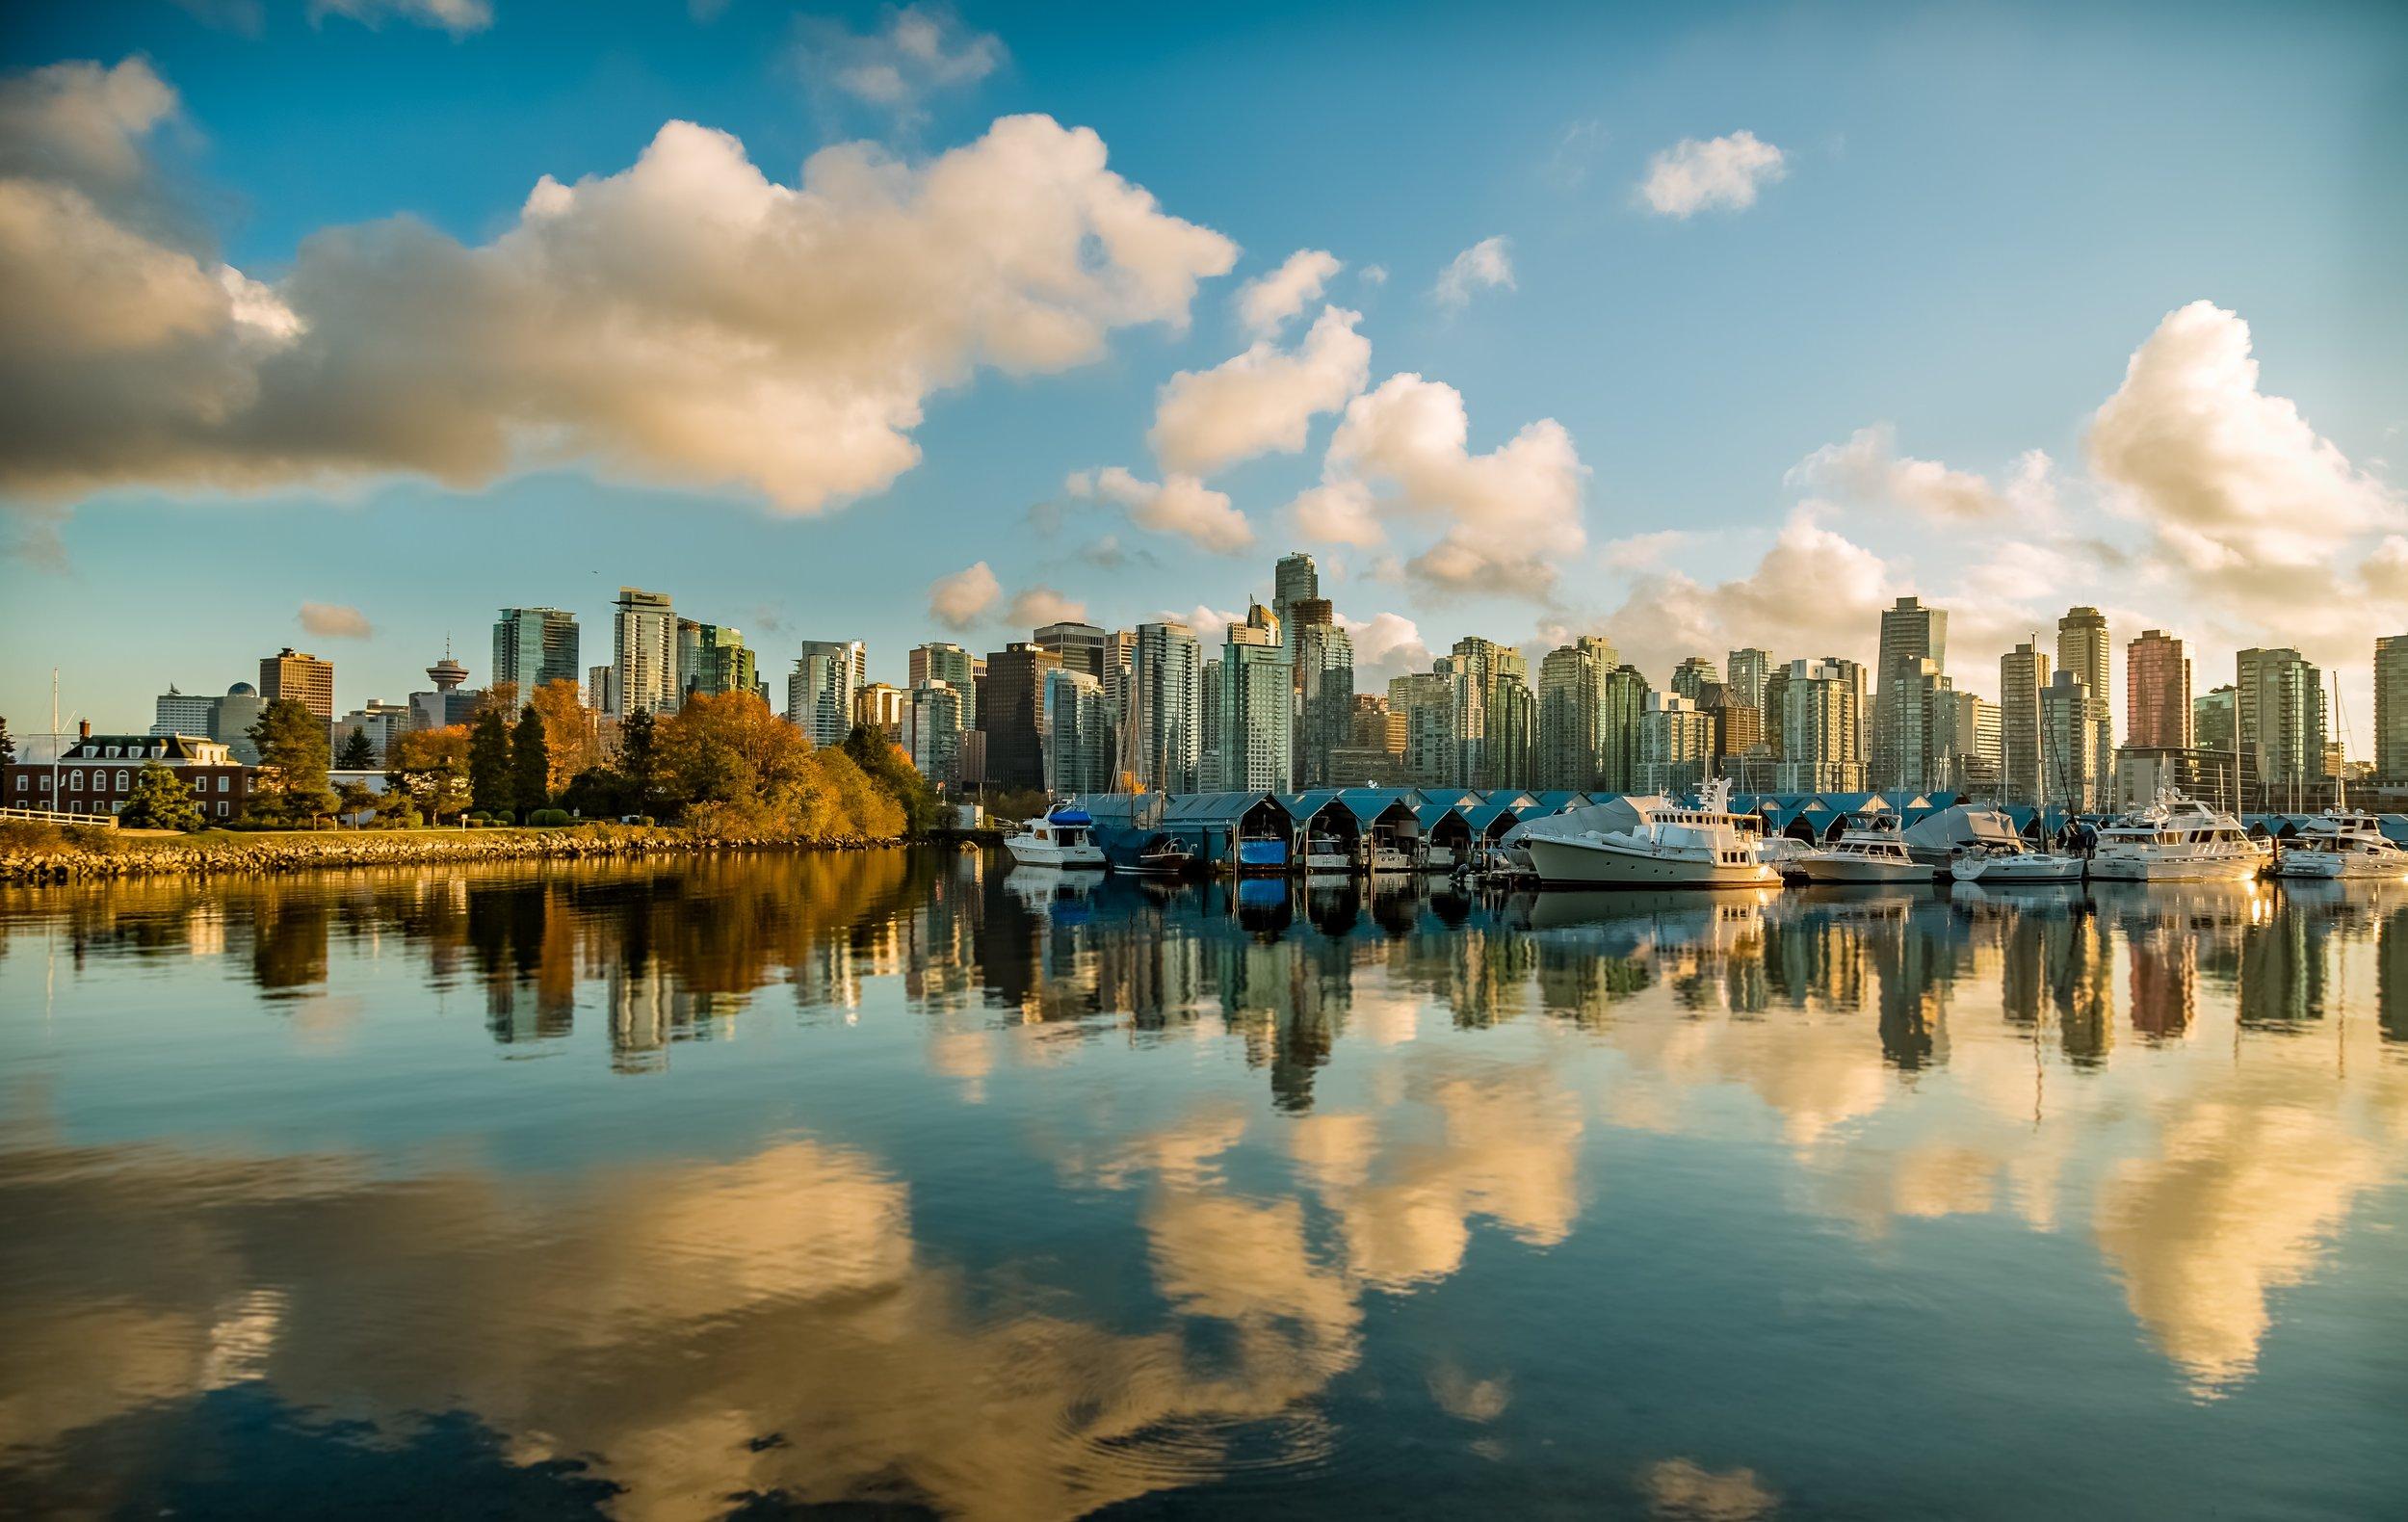 VR-AR-Association-VRARGS-VR-AR-Global-Summit-Vancouver-Spatial-Computing-Immersive-Technology-VR-AR.jpg